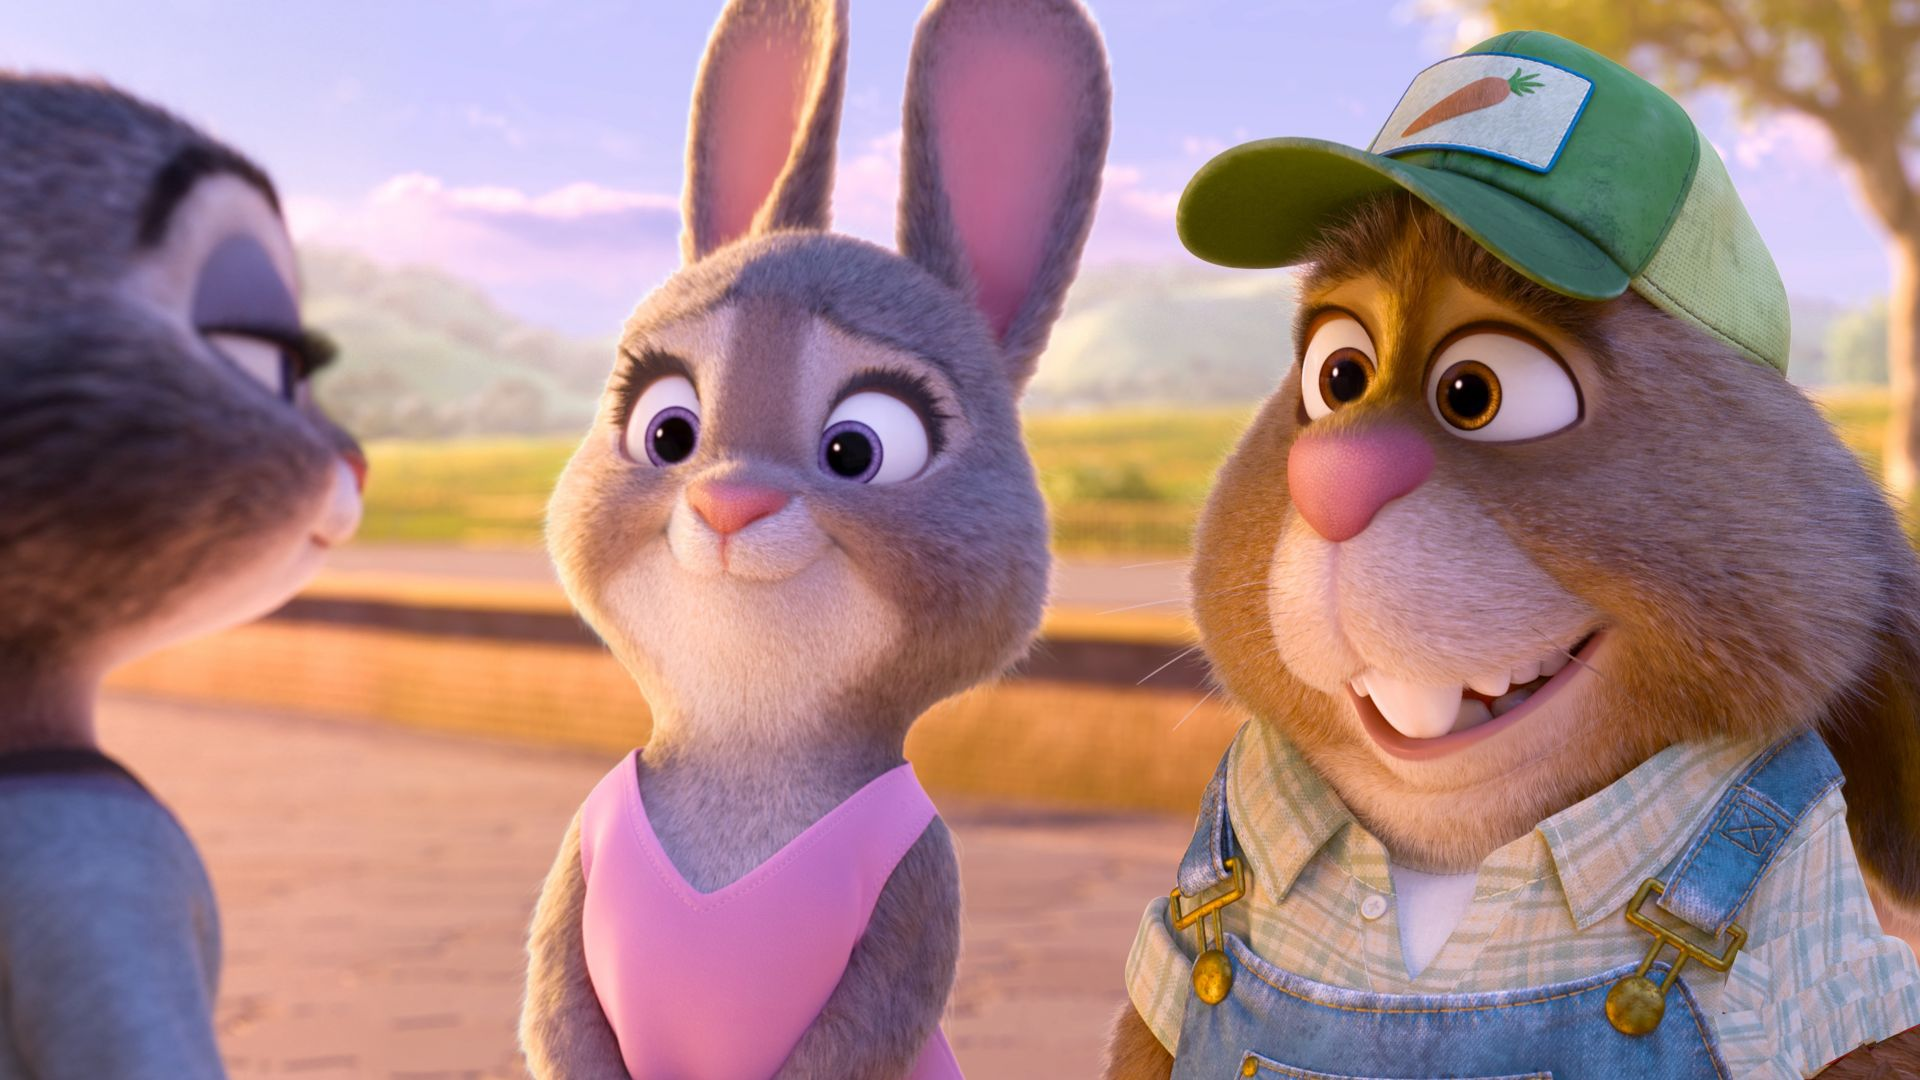 wallpaper zootopia, rabbit, best animation movies of 2016, cartoon